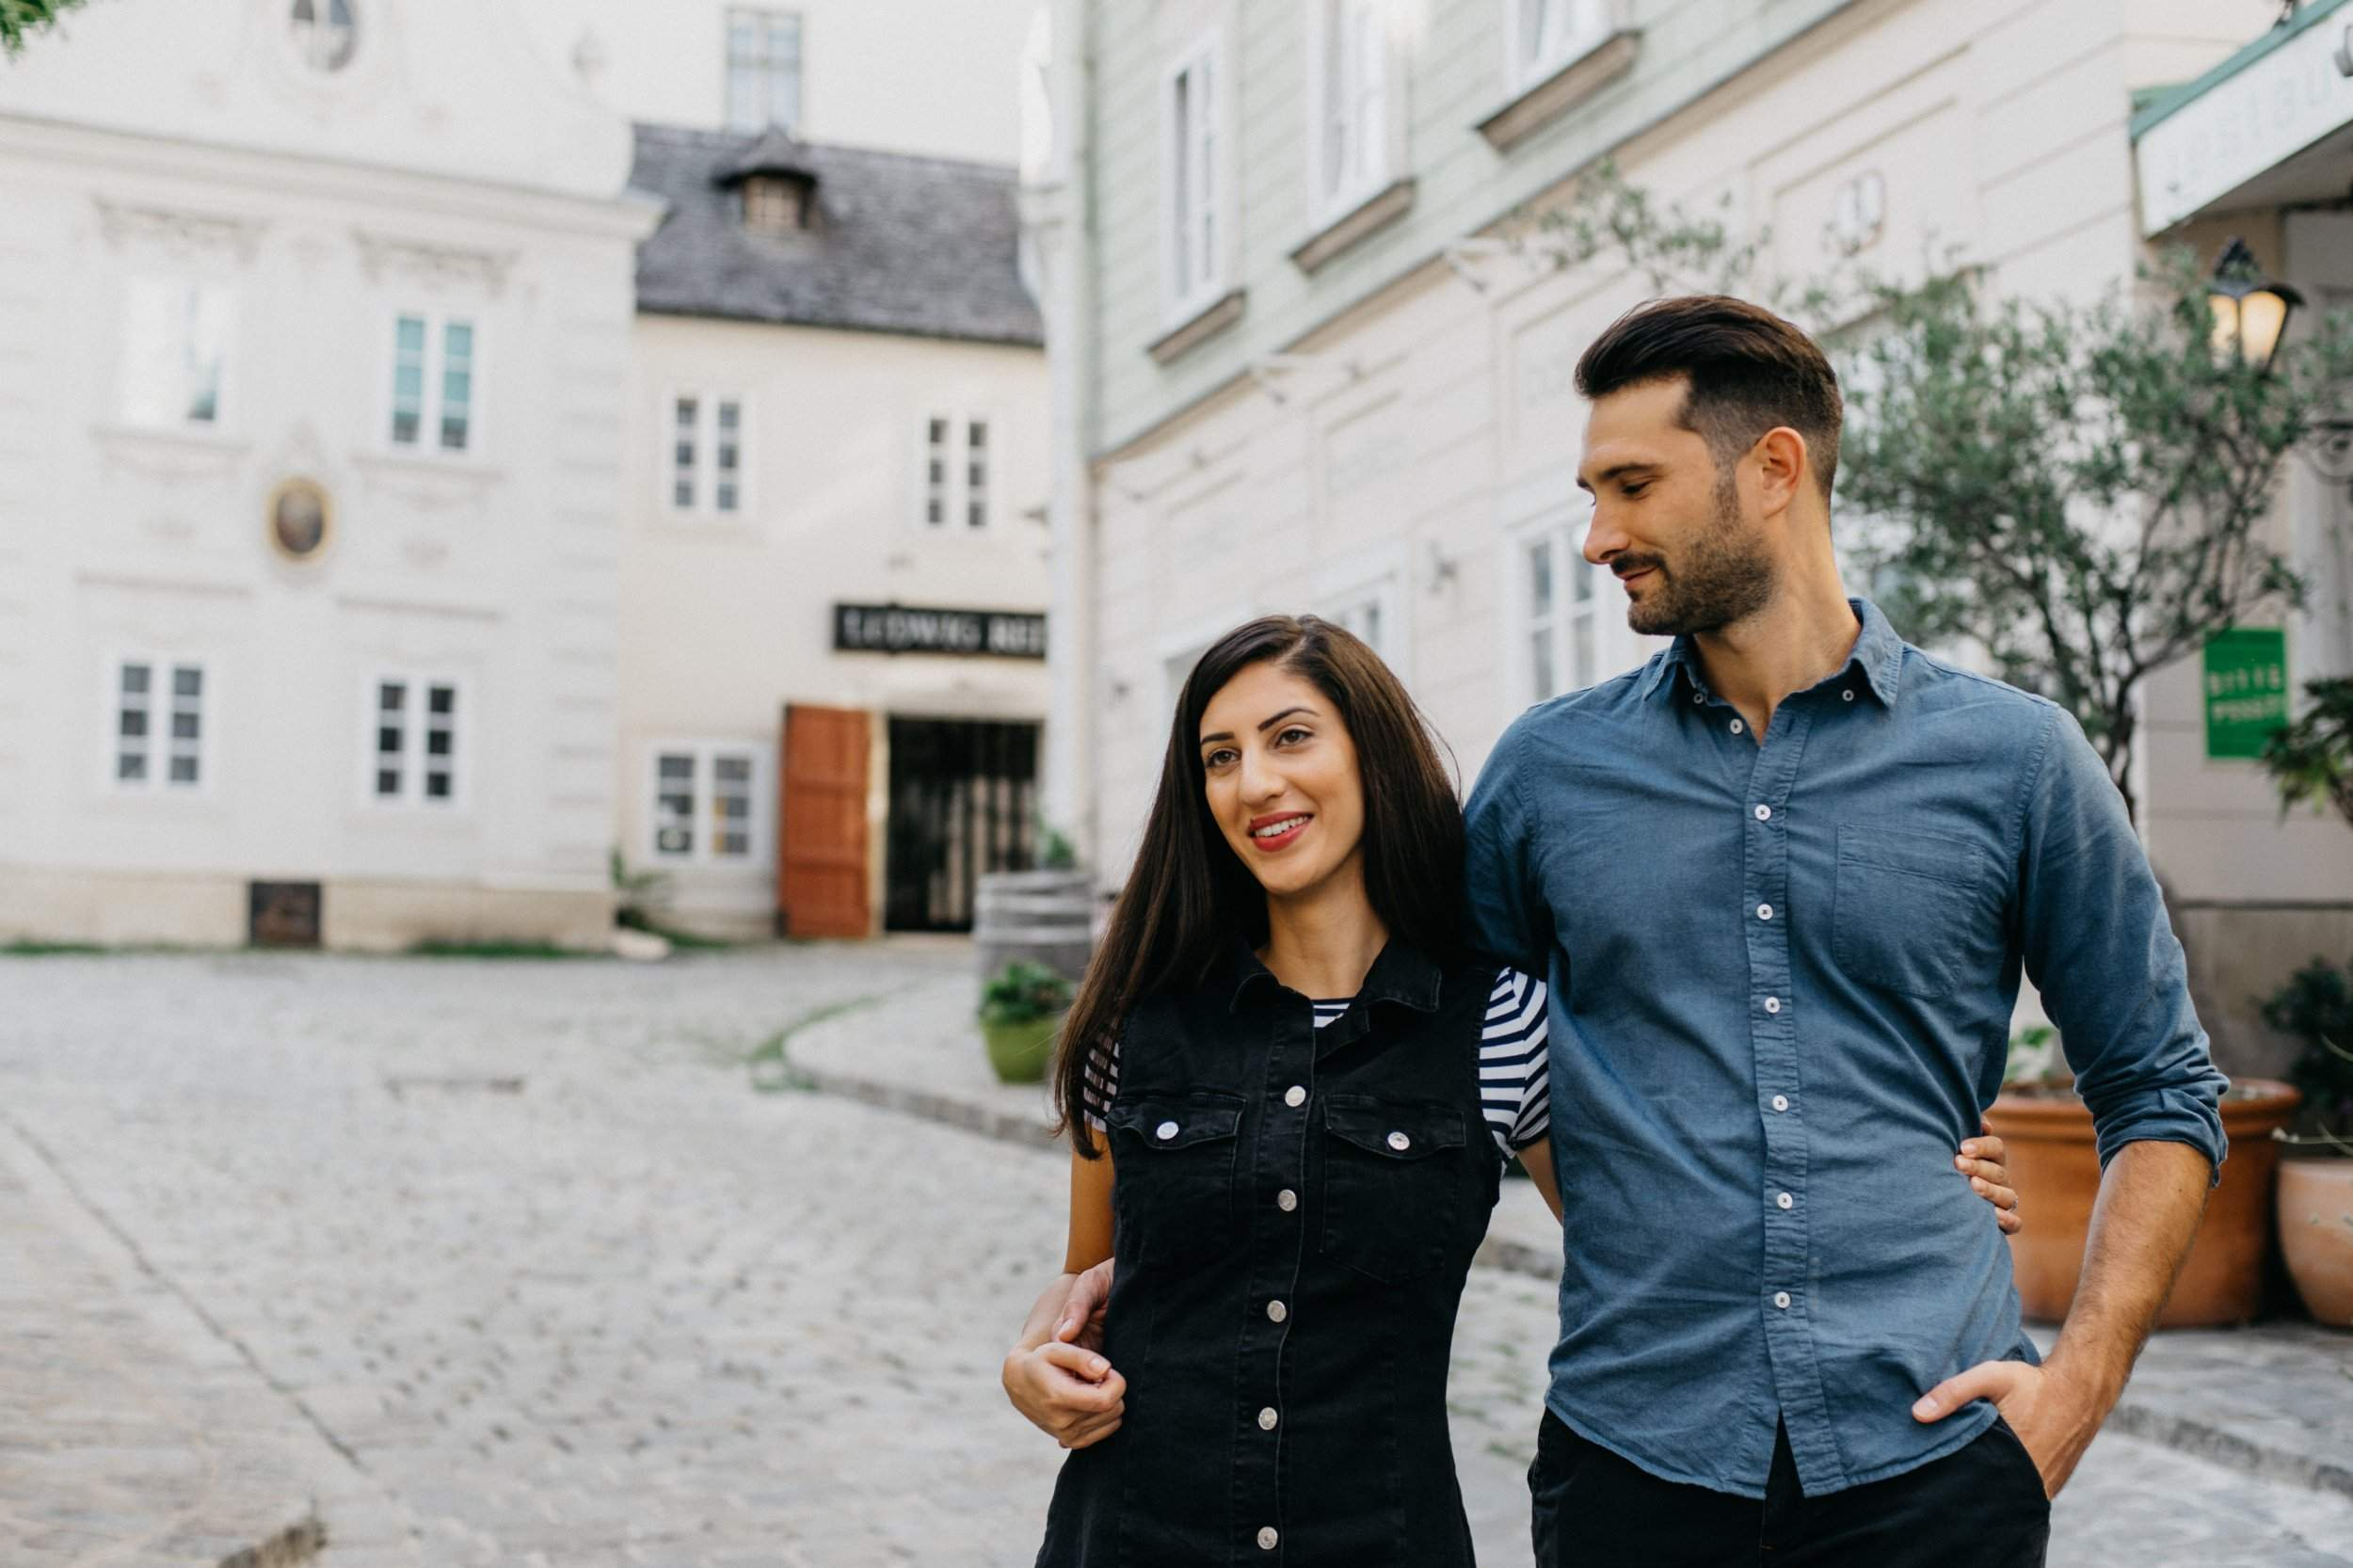 Verlobung shooting in Wien